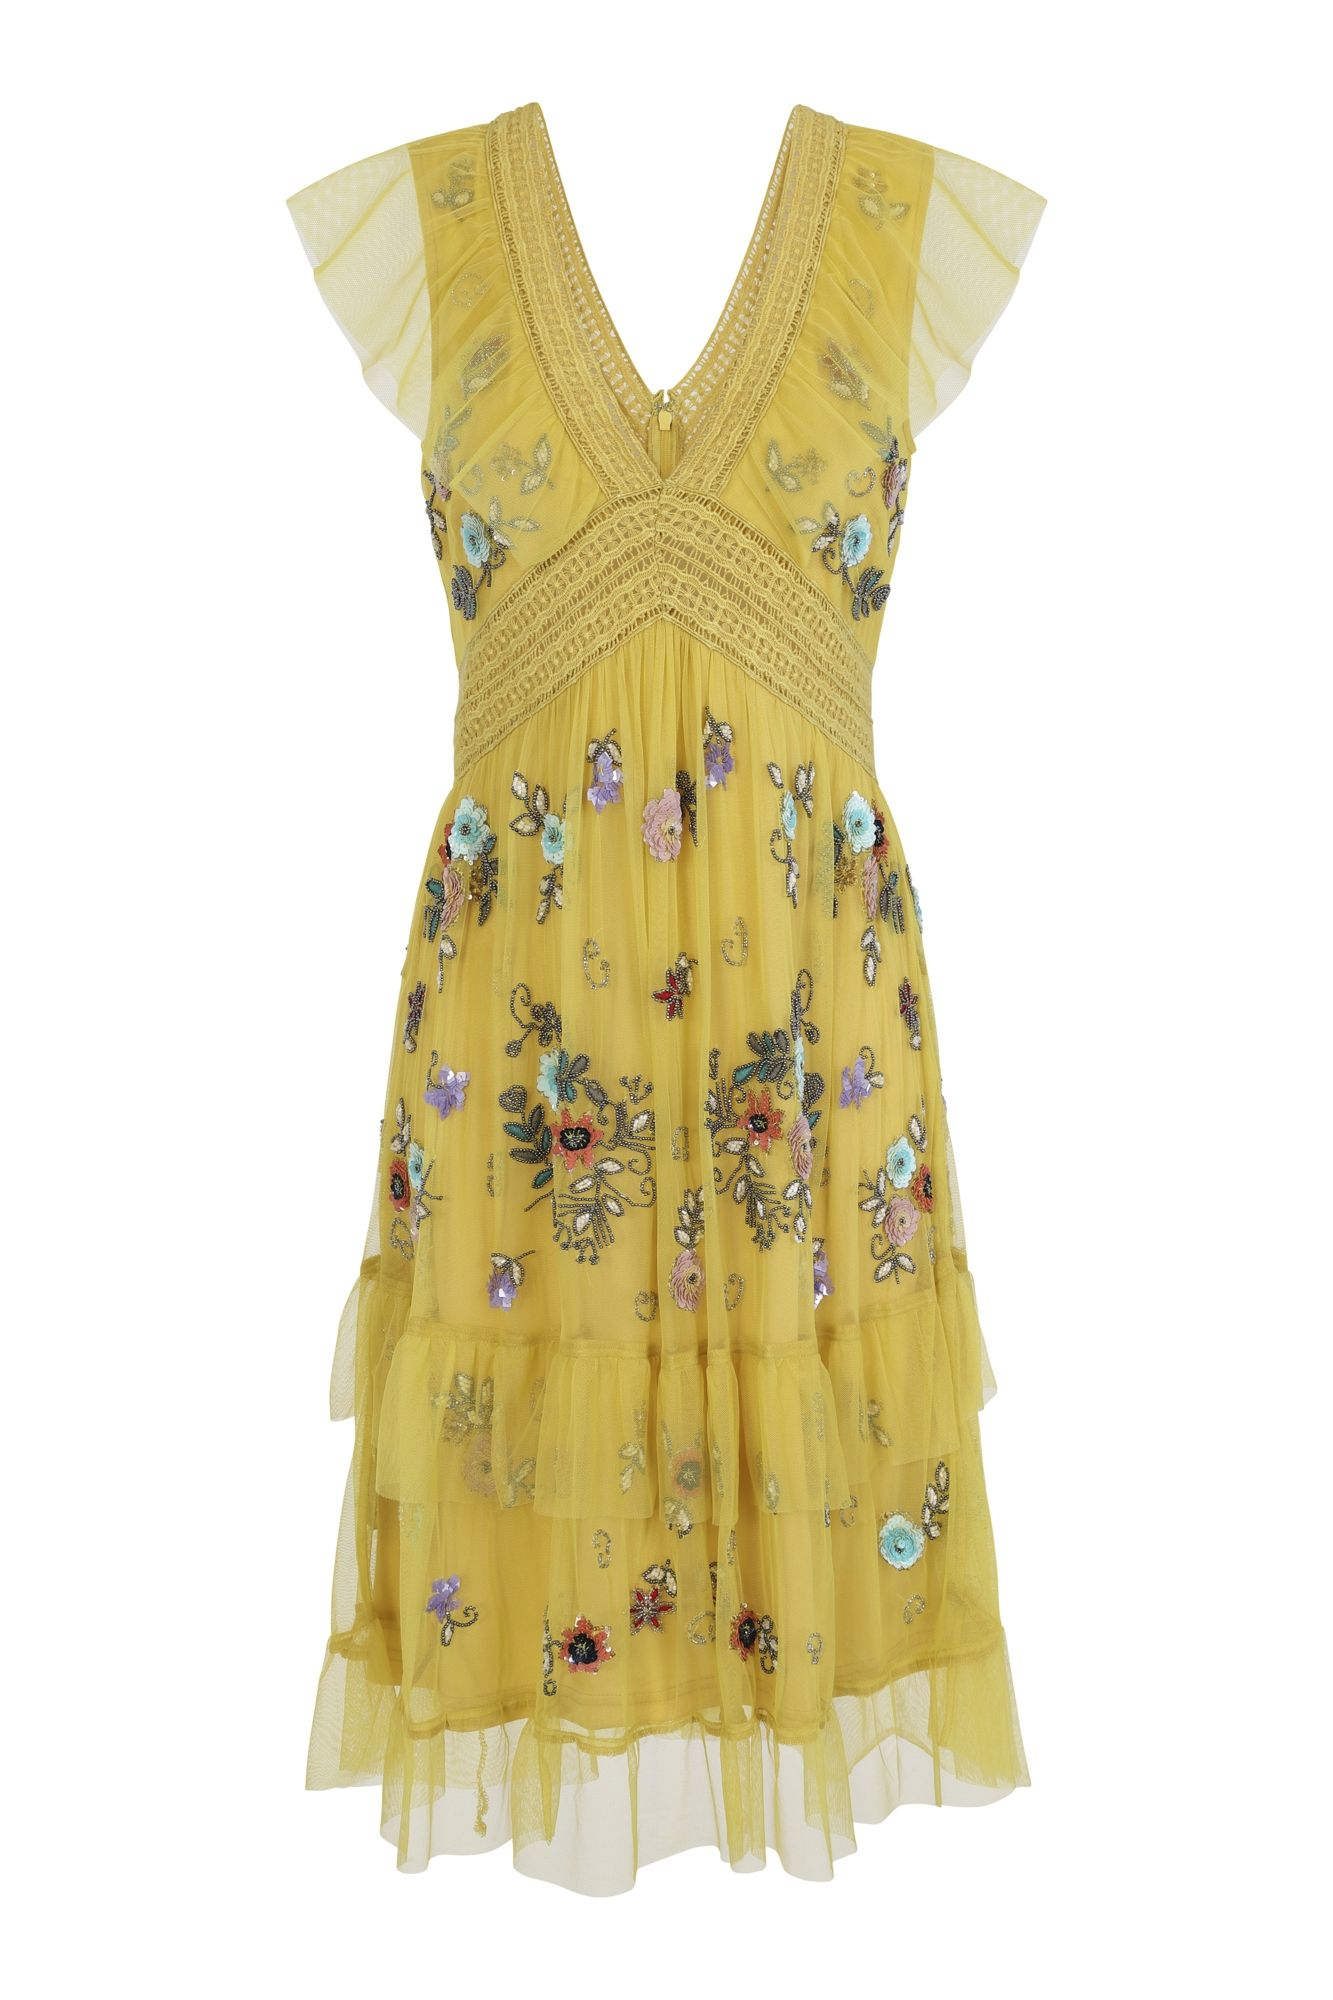 cd5dc7c03bac2 Gabby Embellished V Neck Dress in 2019 | S/S 19 Collection | Dresses ...